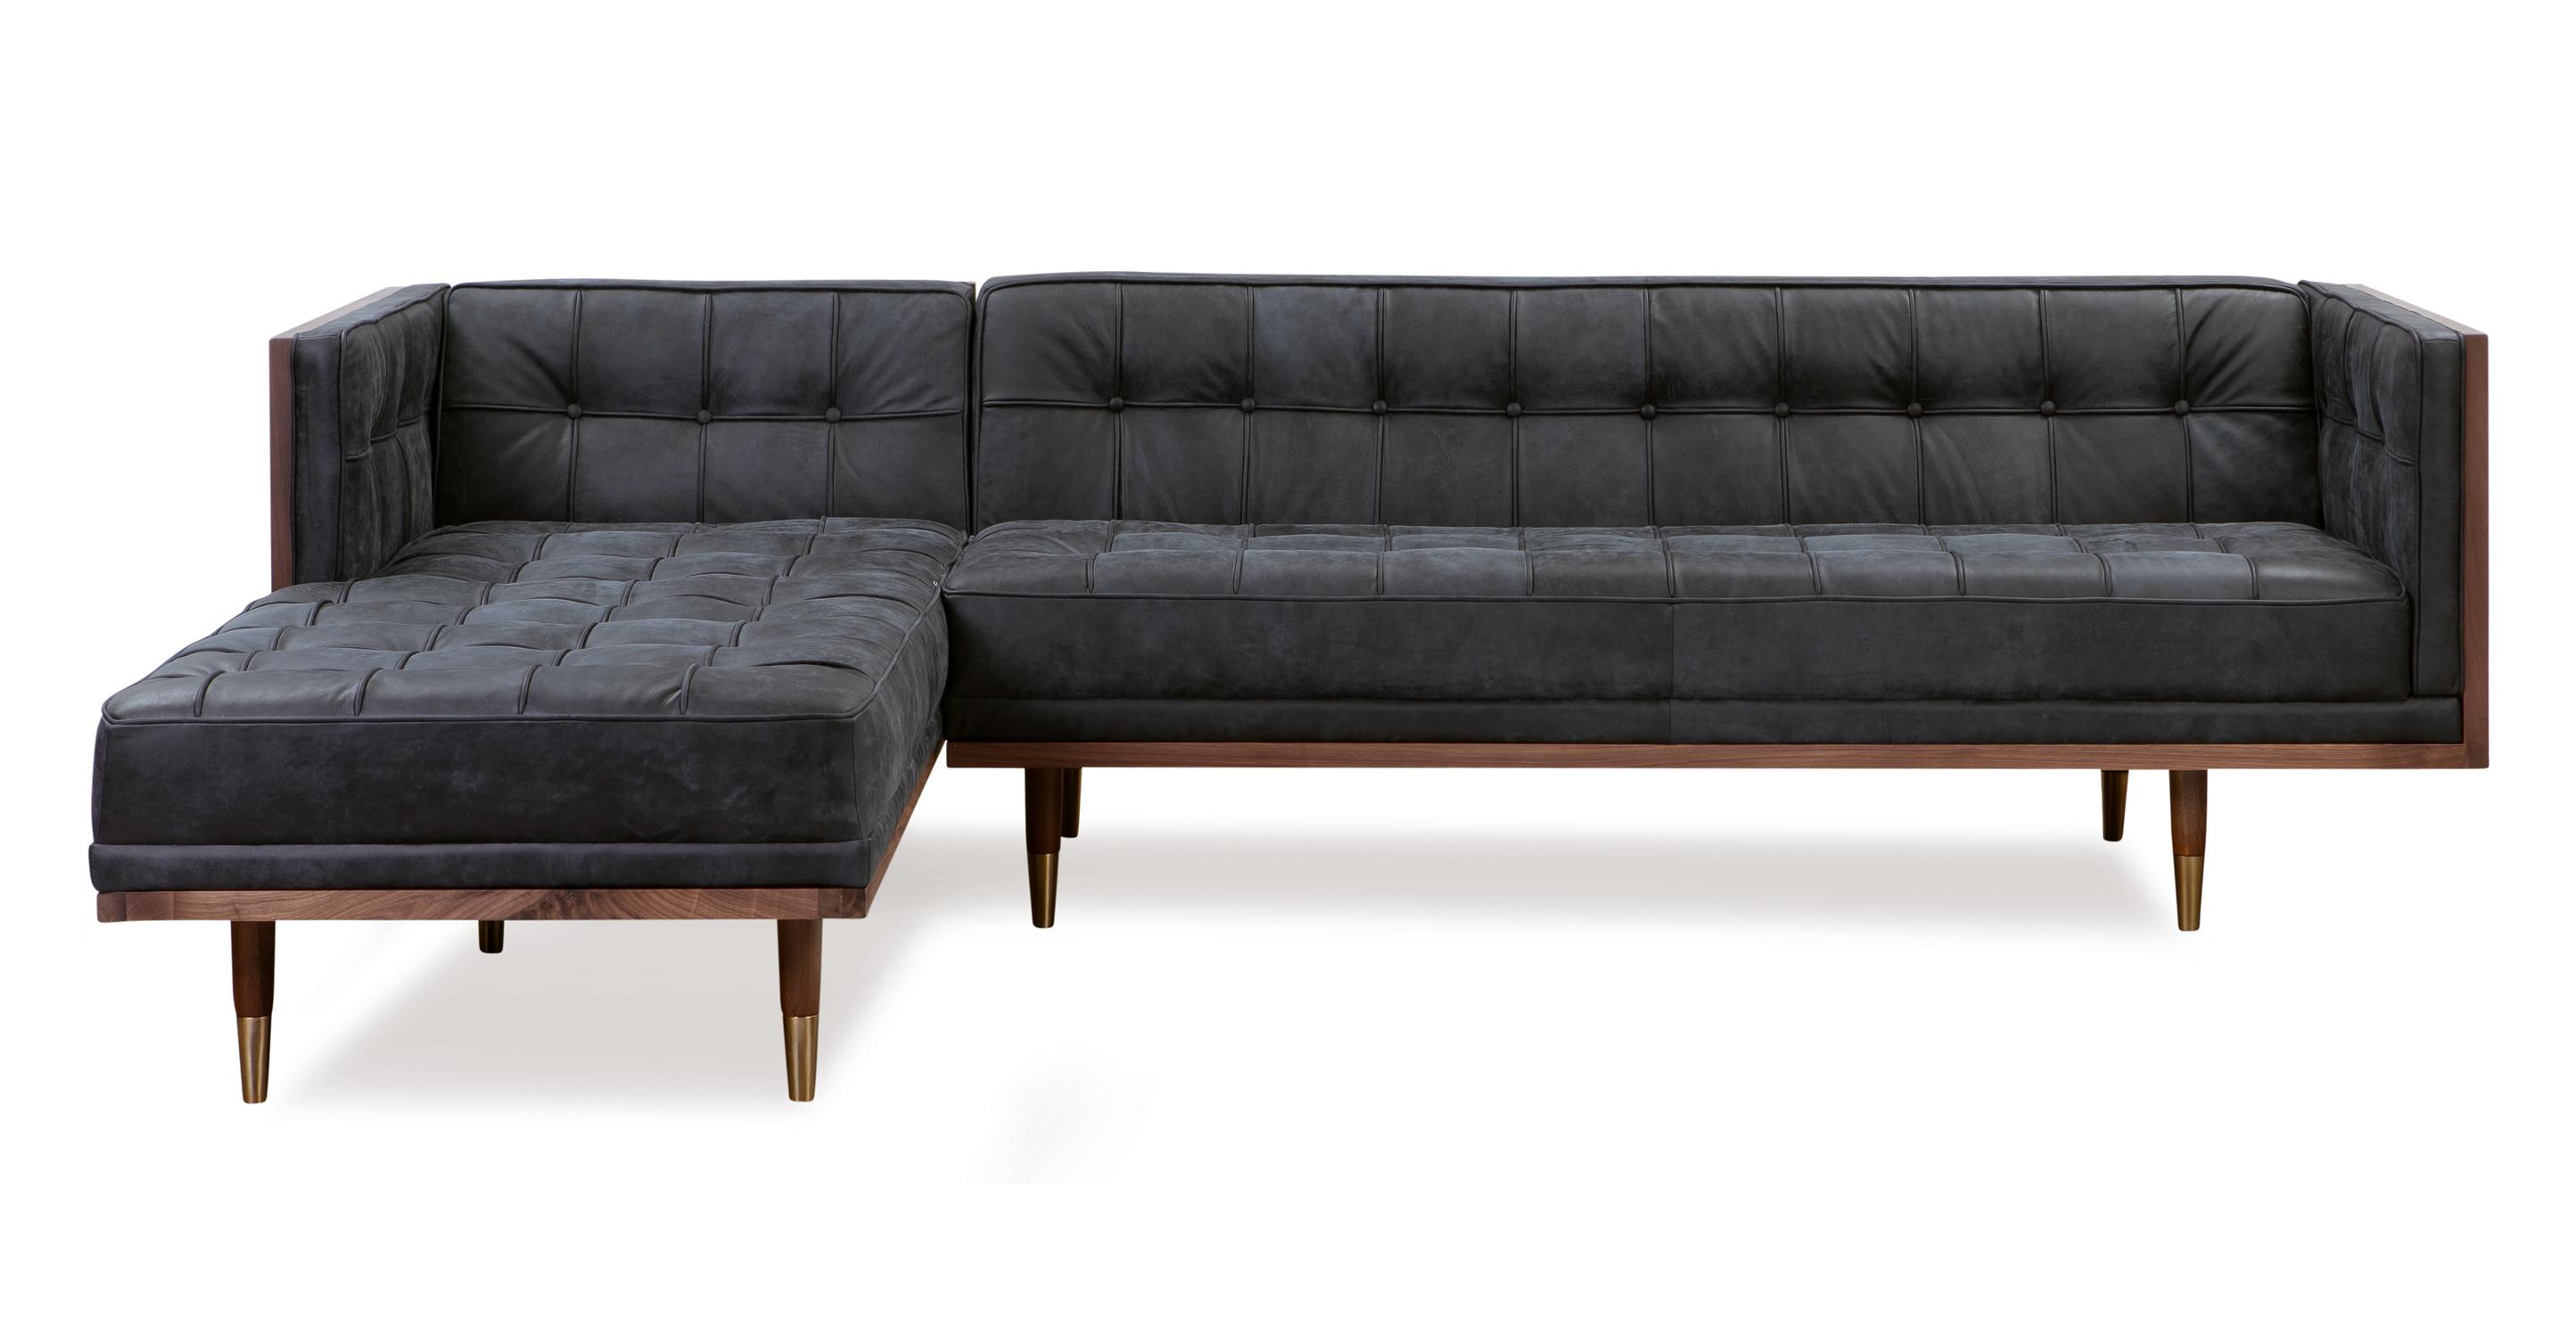 Woodrow Box Sofa Sectional Left, Walnut/Night